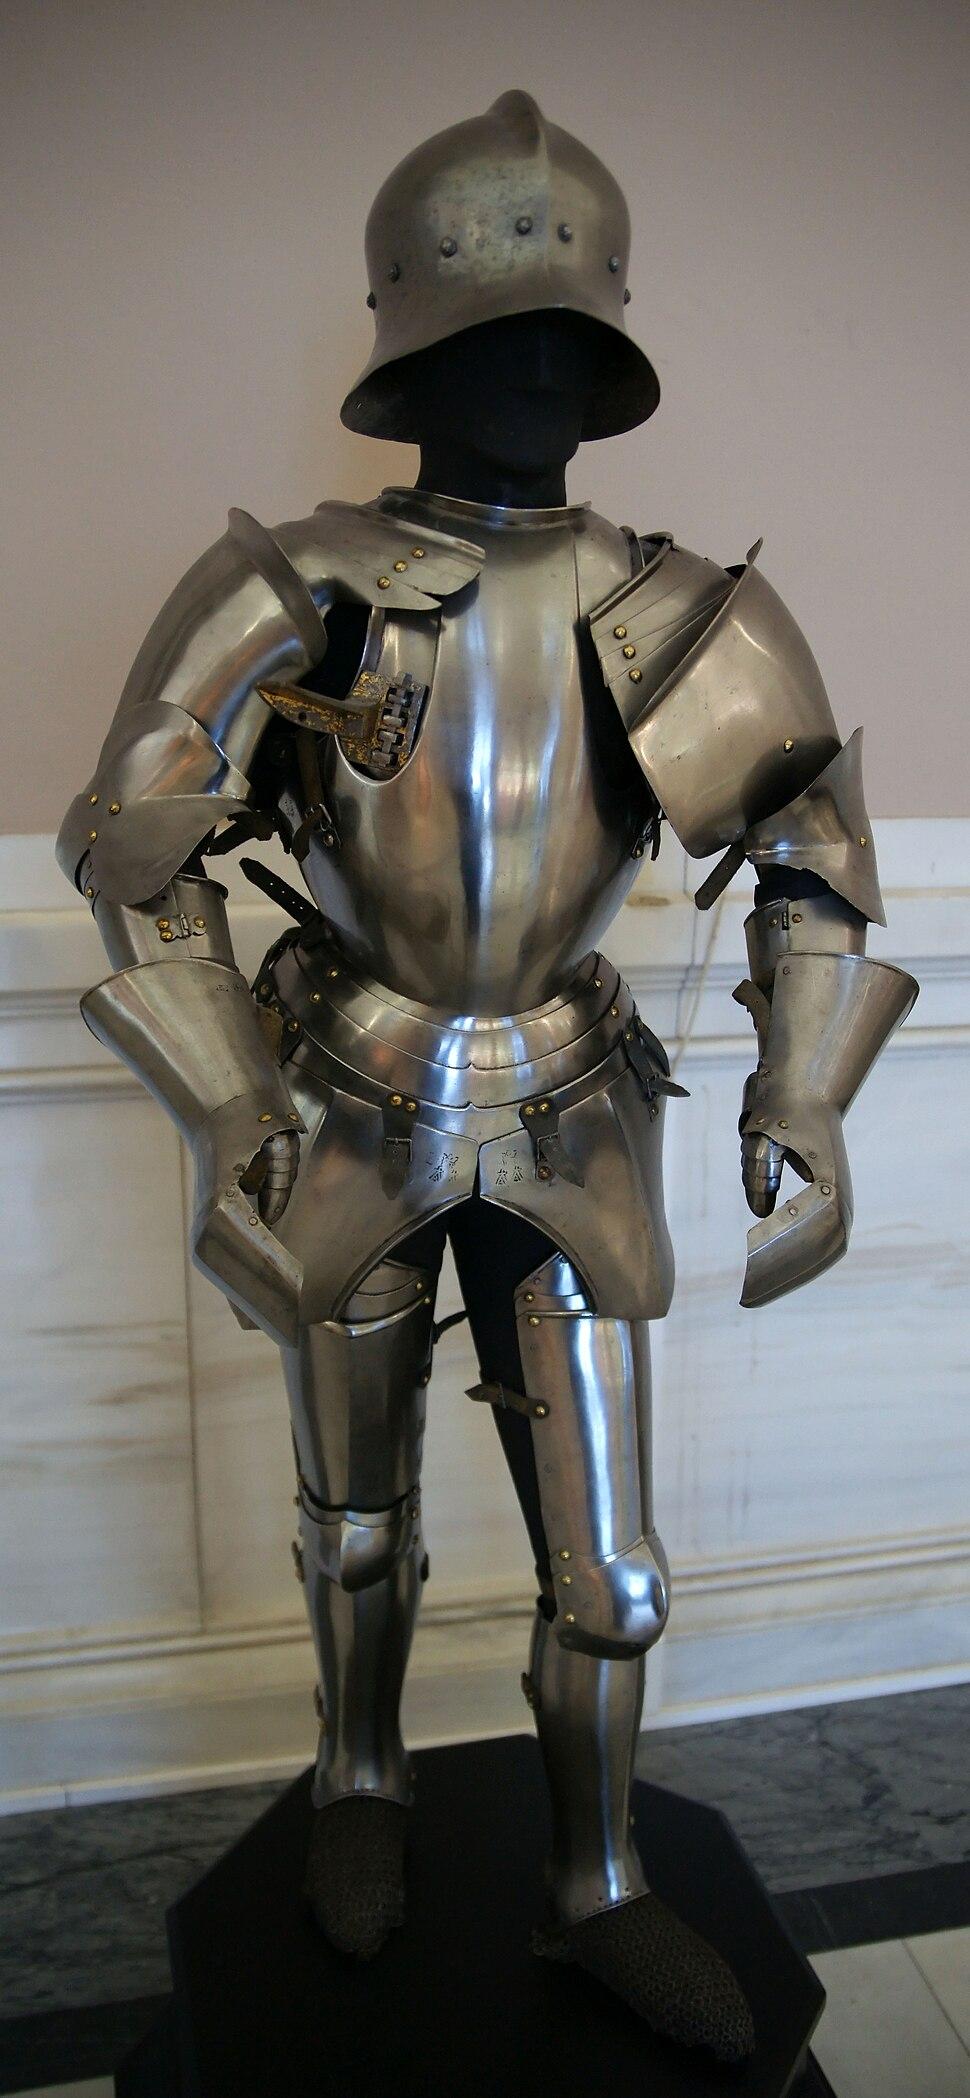 KHM Wien A 3 - Armor of Roberto da Sanseverino (d. 1487)